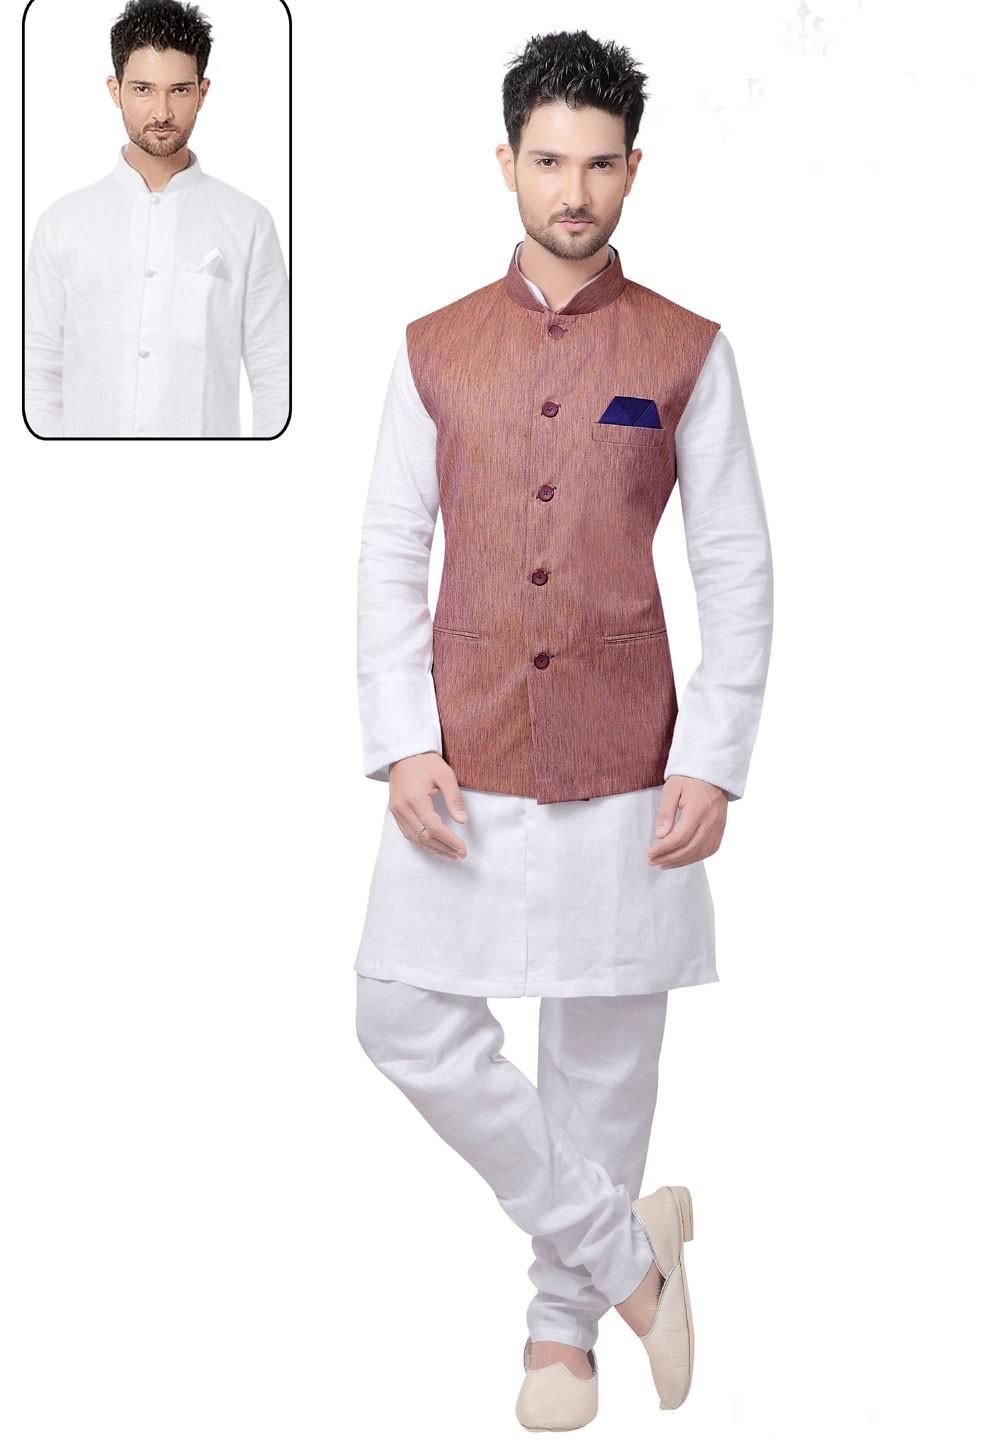 Exquisite Men's White,Peach Color Readymade Kurta Pyjama With Jacket.